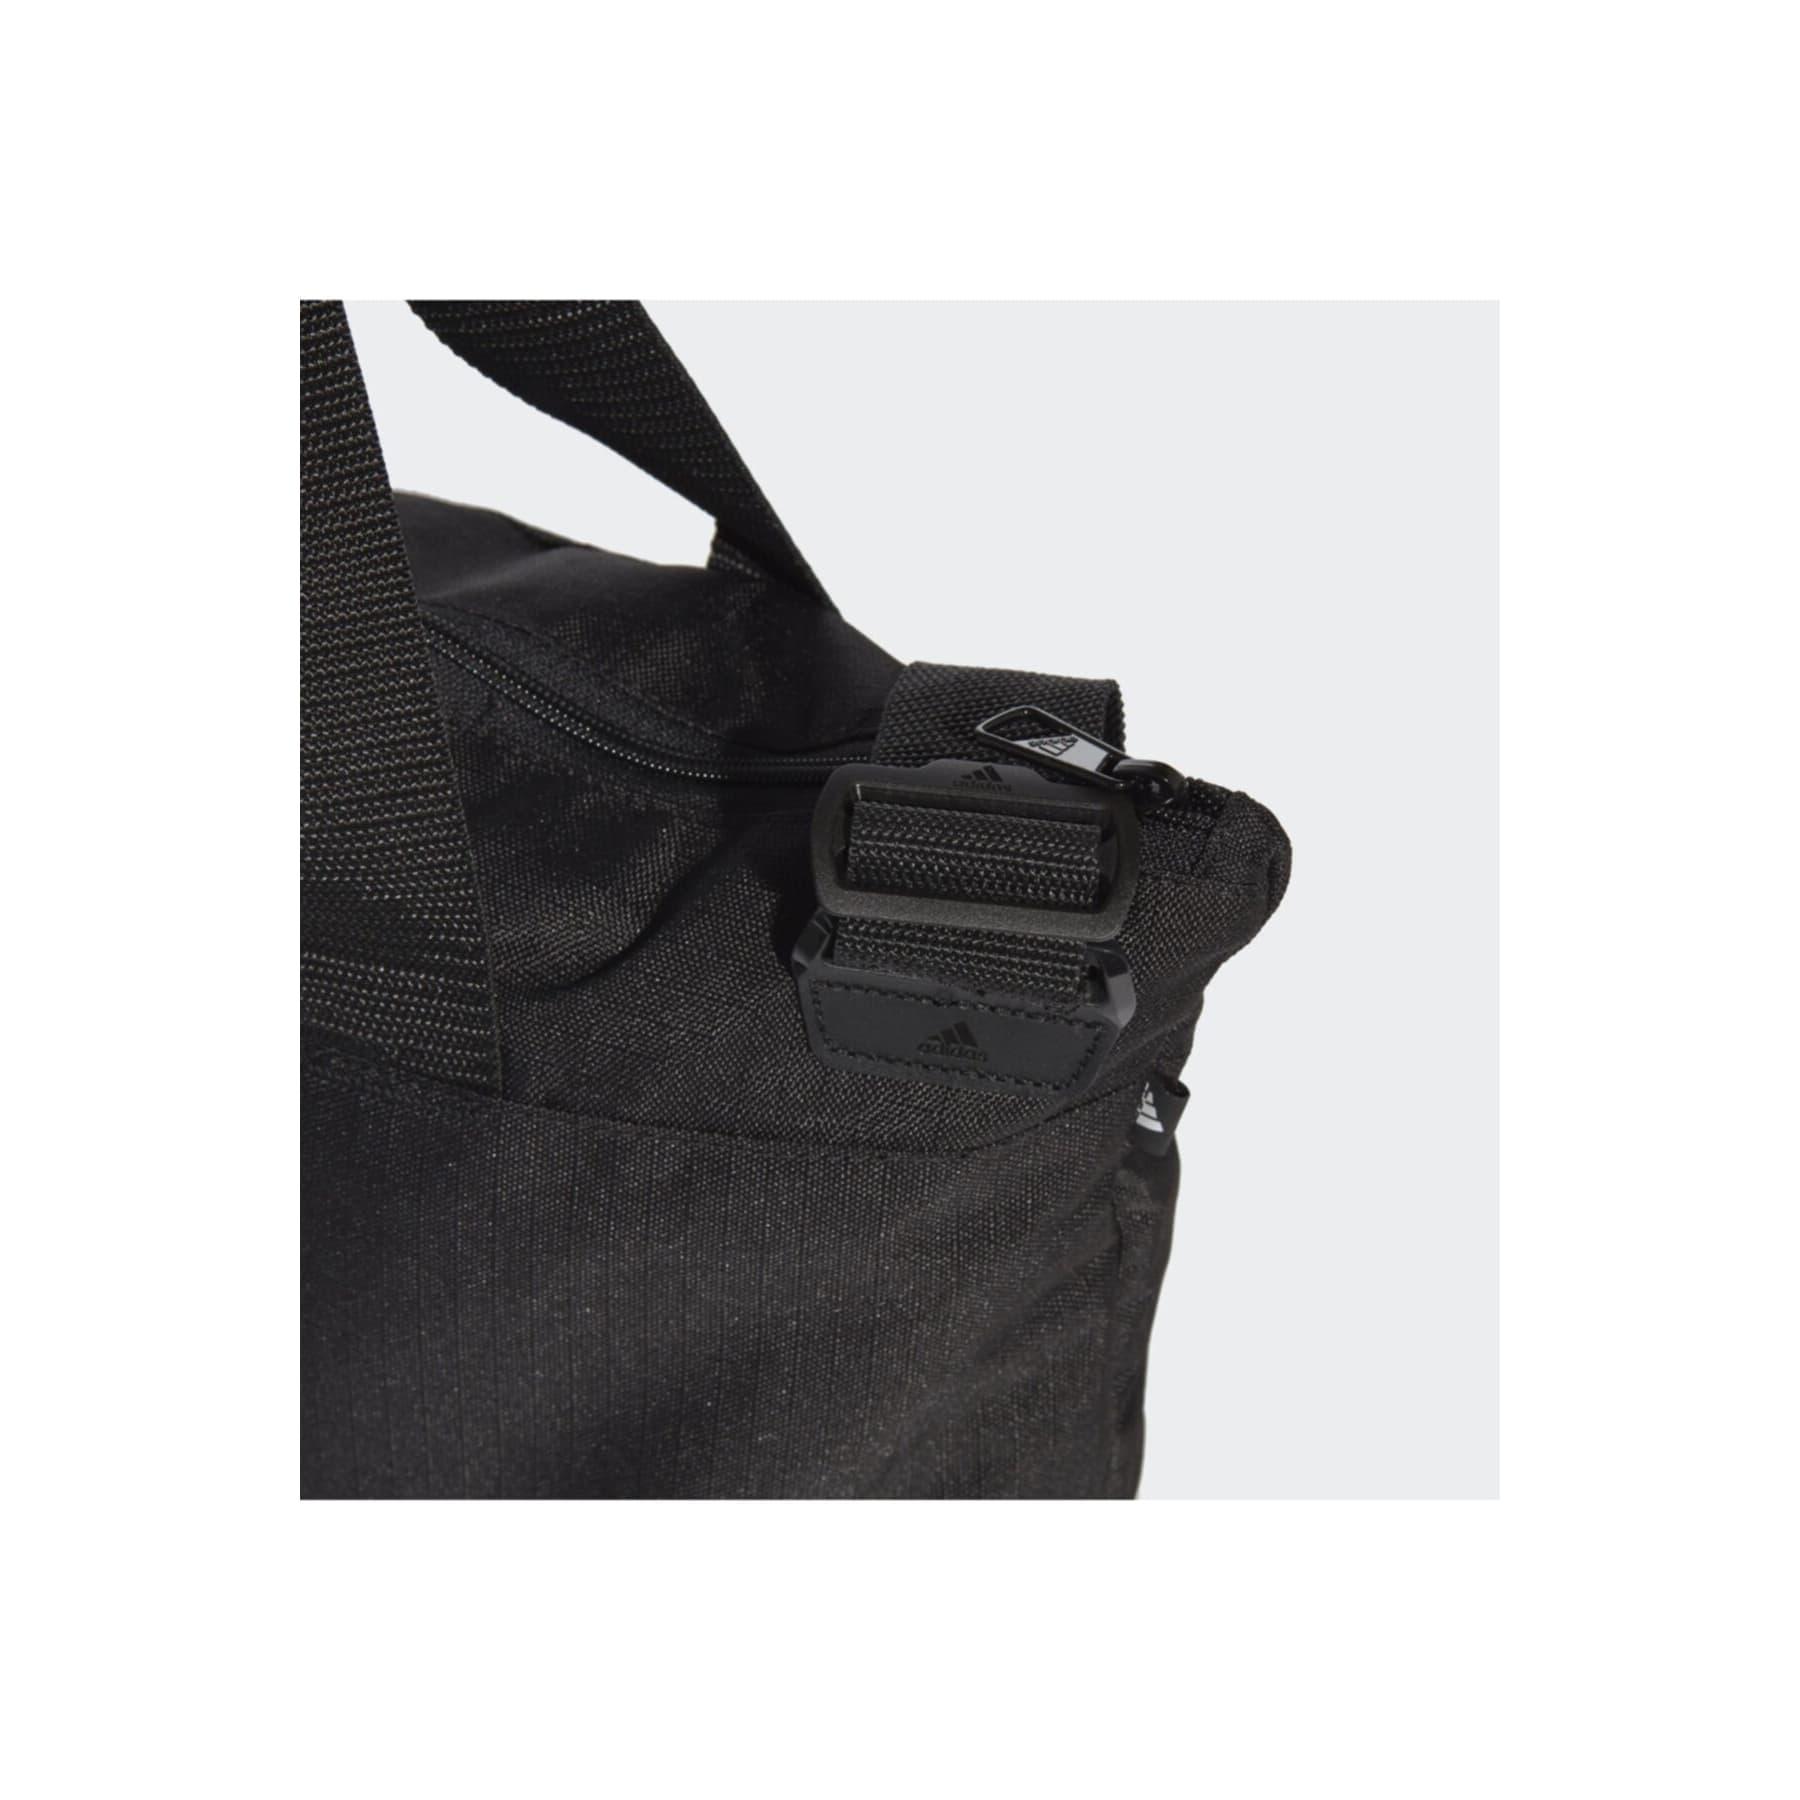 Essentials 3-Stripes Tote Siyah Omuz Çantası (GN2032)